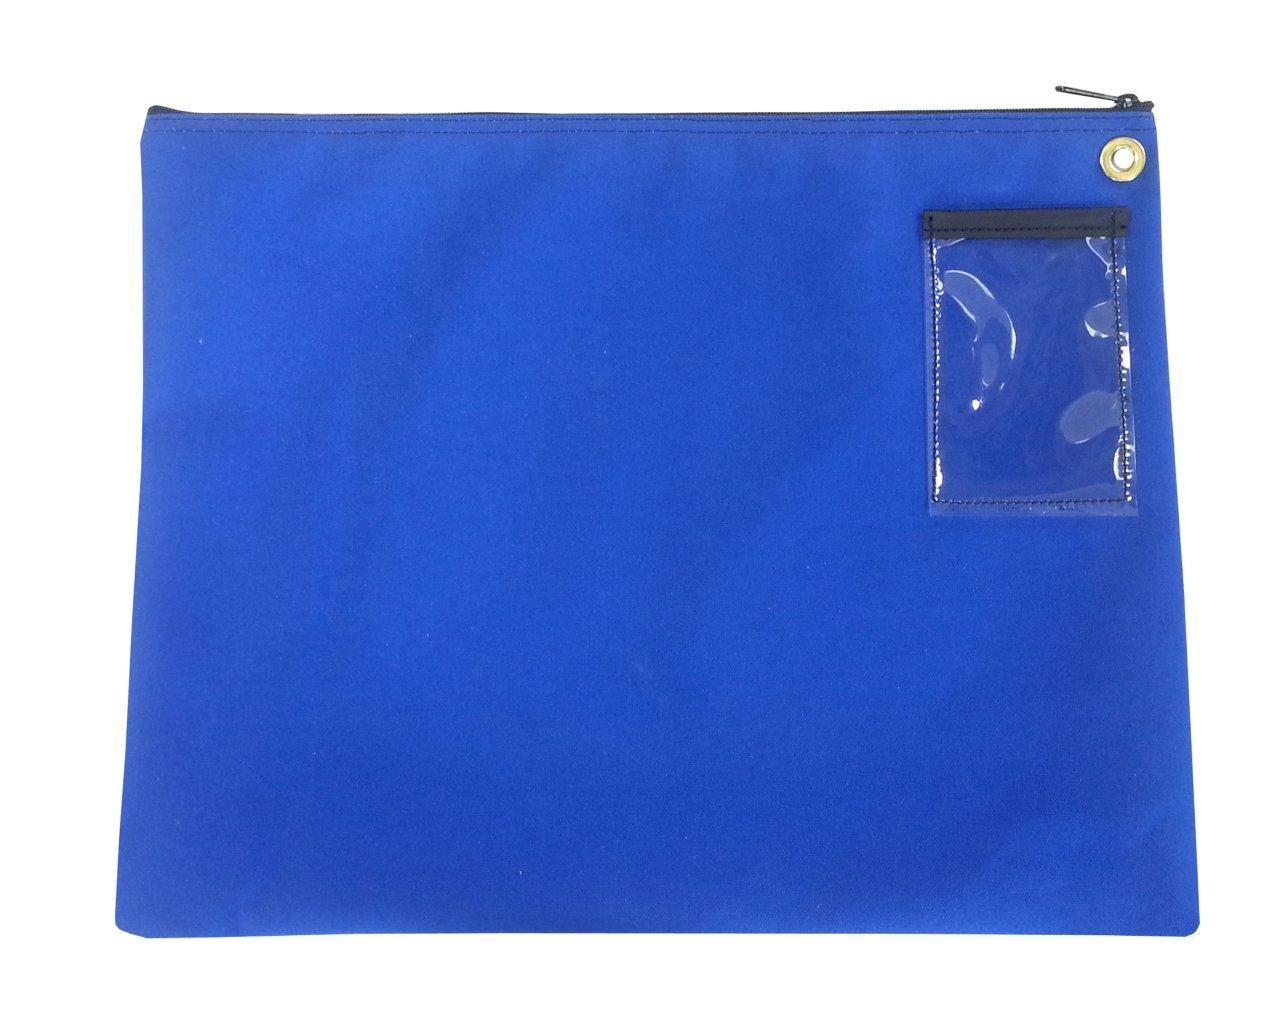 Interoffice Mailer Canvas Transit Sack Zipper Bag 18w x 14h Royal Blue by Cardinal bag supplies